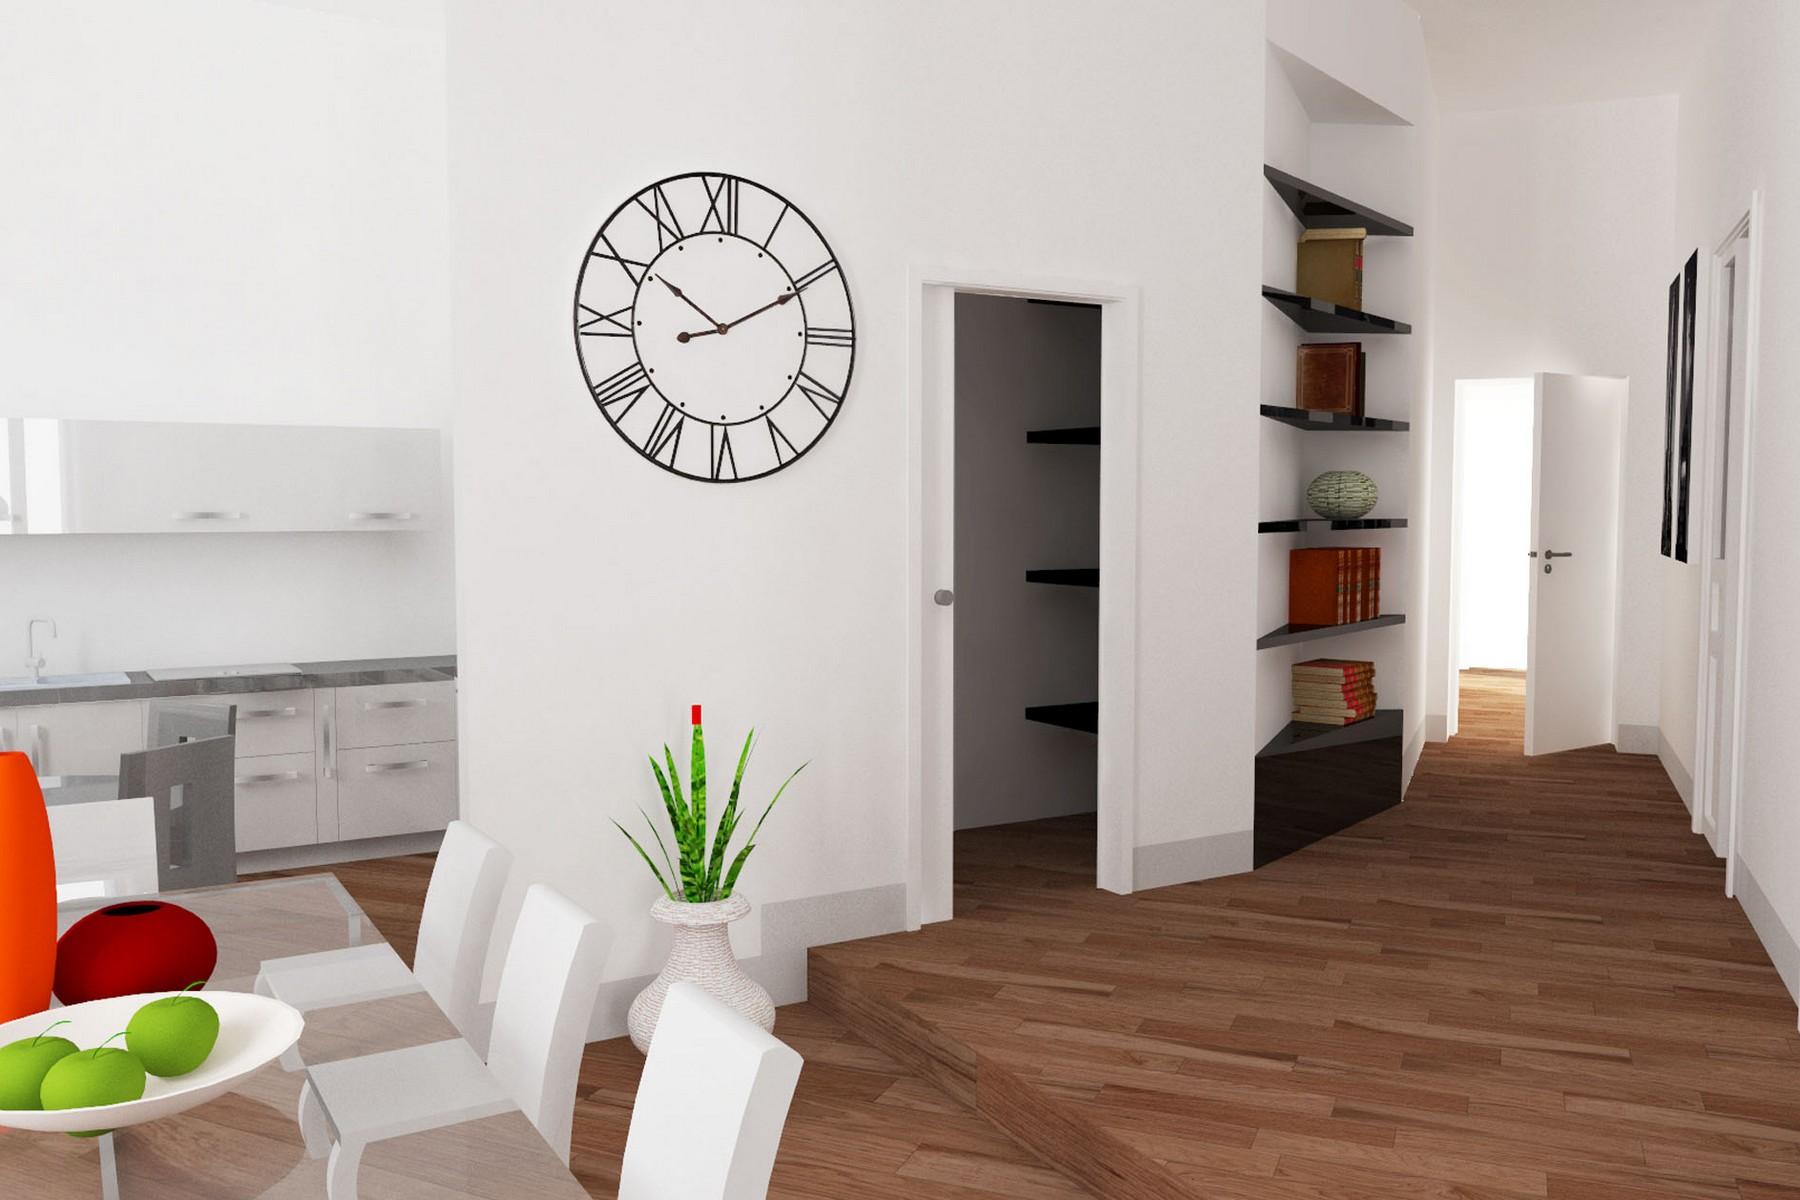 Single Family Home for Sale at Bright apartment in historic building Corso Peschiera Torino, Turin 10138 Italy